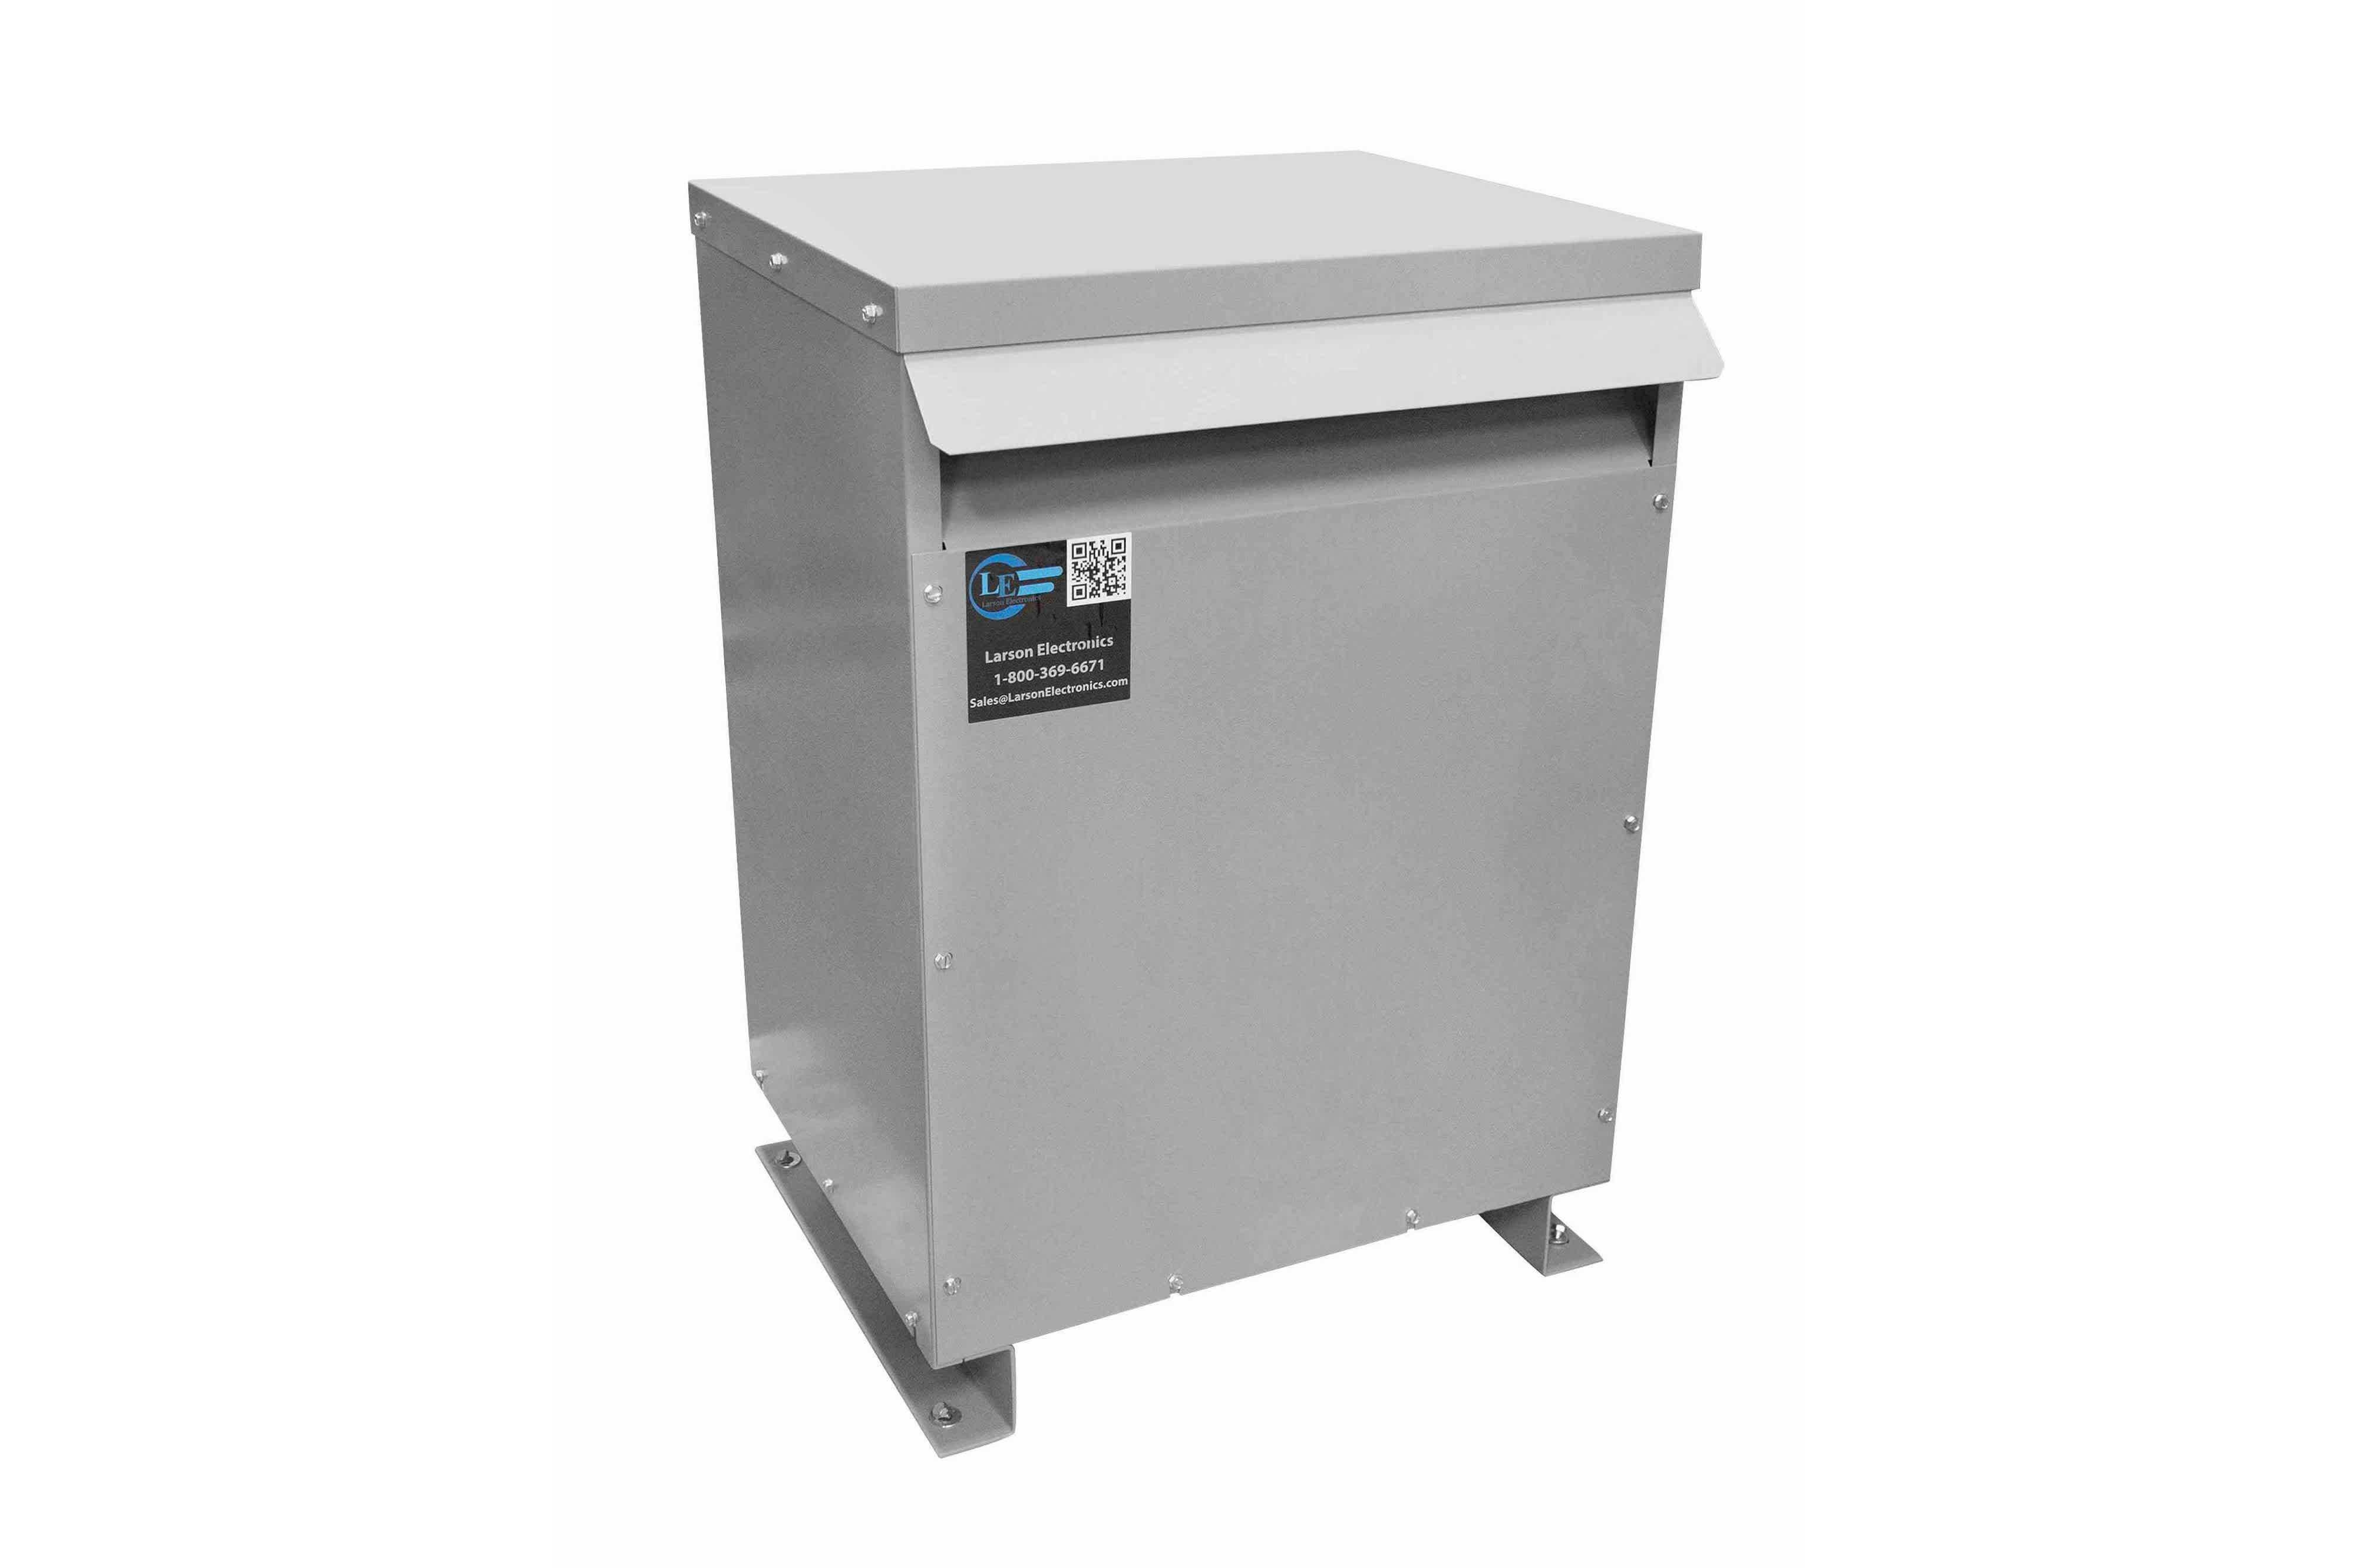 37.5 kVA 3PH Isolation Transformer, 440V Wye Primary, 208Y/120 Wye-N Secondary, N3R, Ventilated, 60 Hz